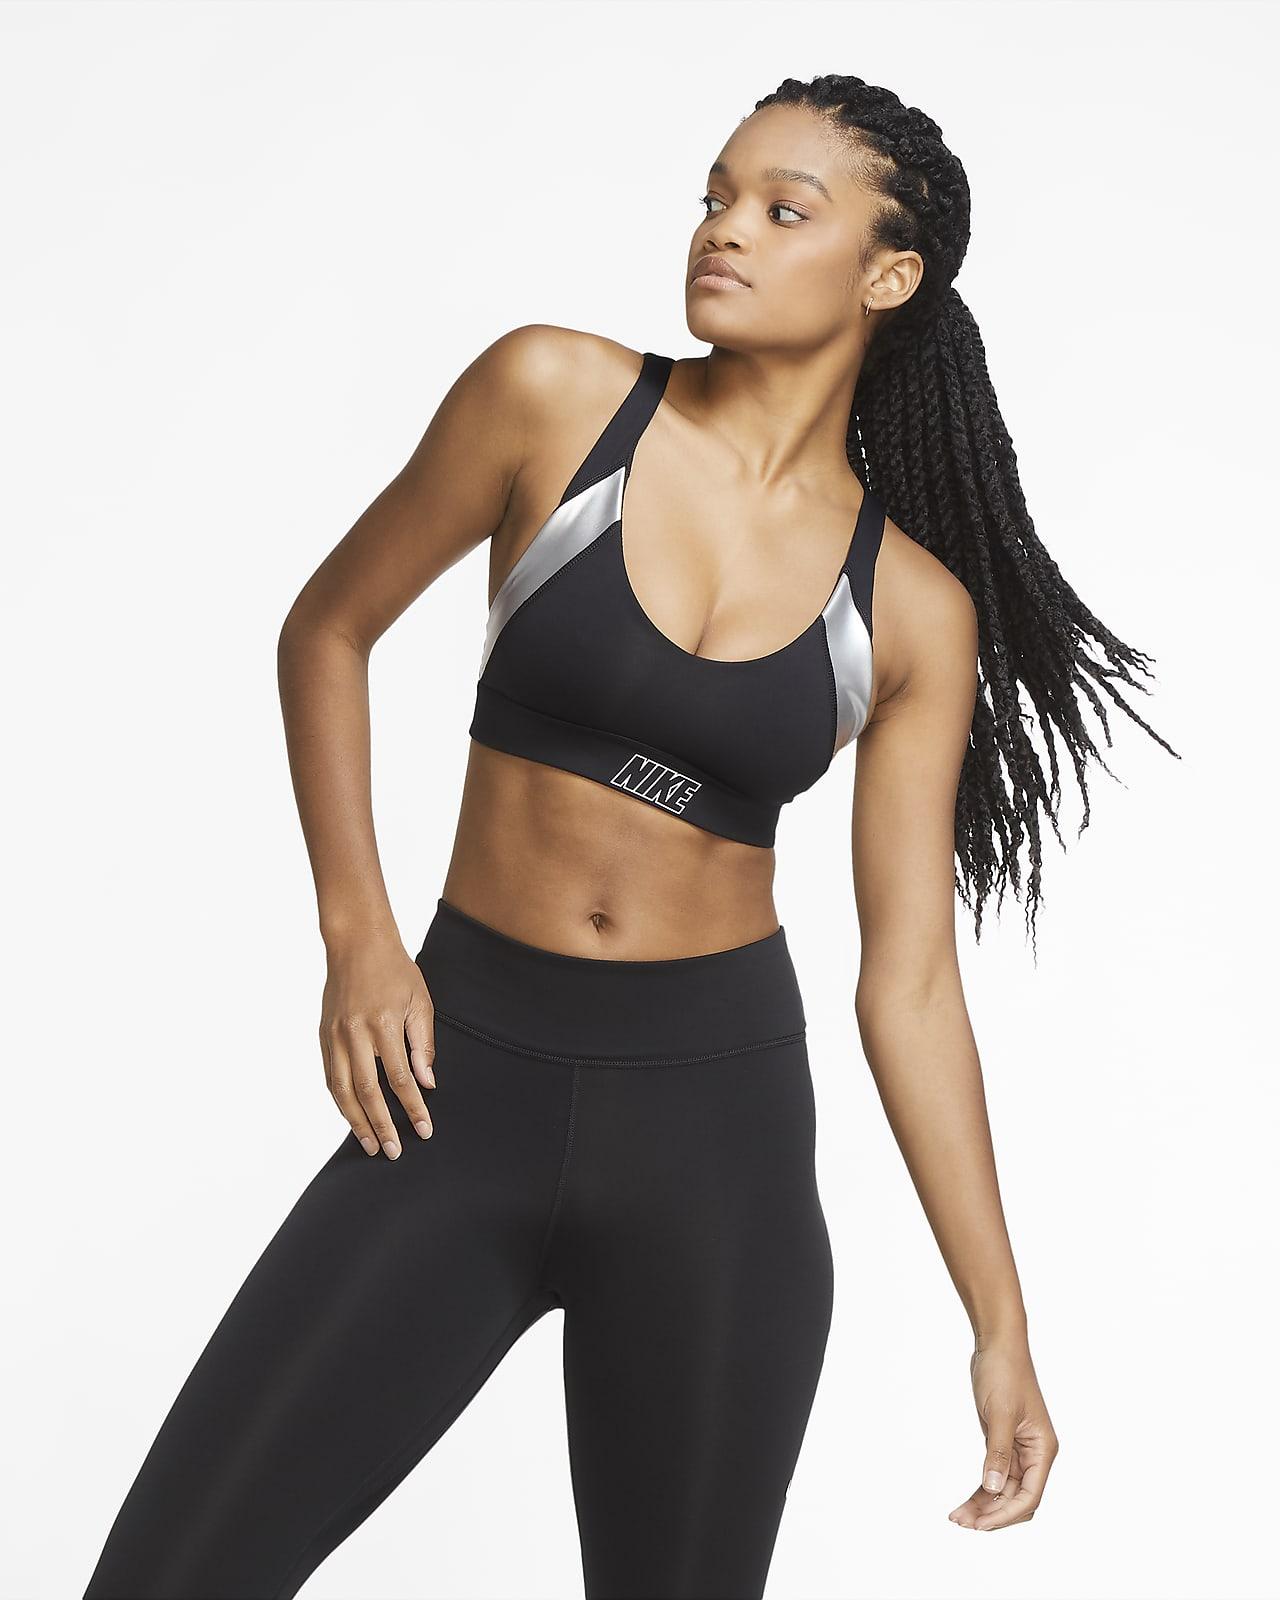 Nike Indy Women's Light-Support Padded Metallic Sports Bra